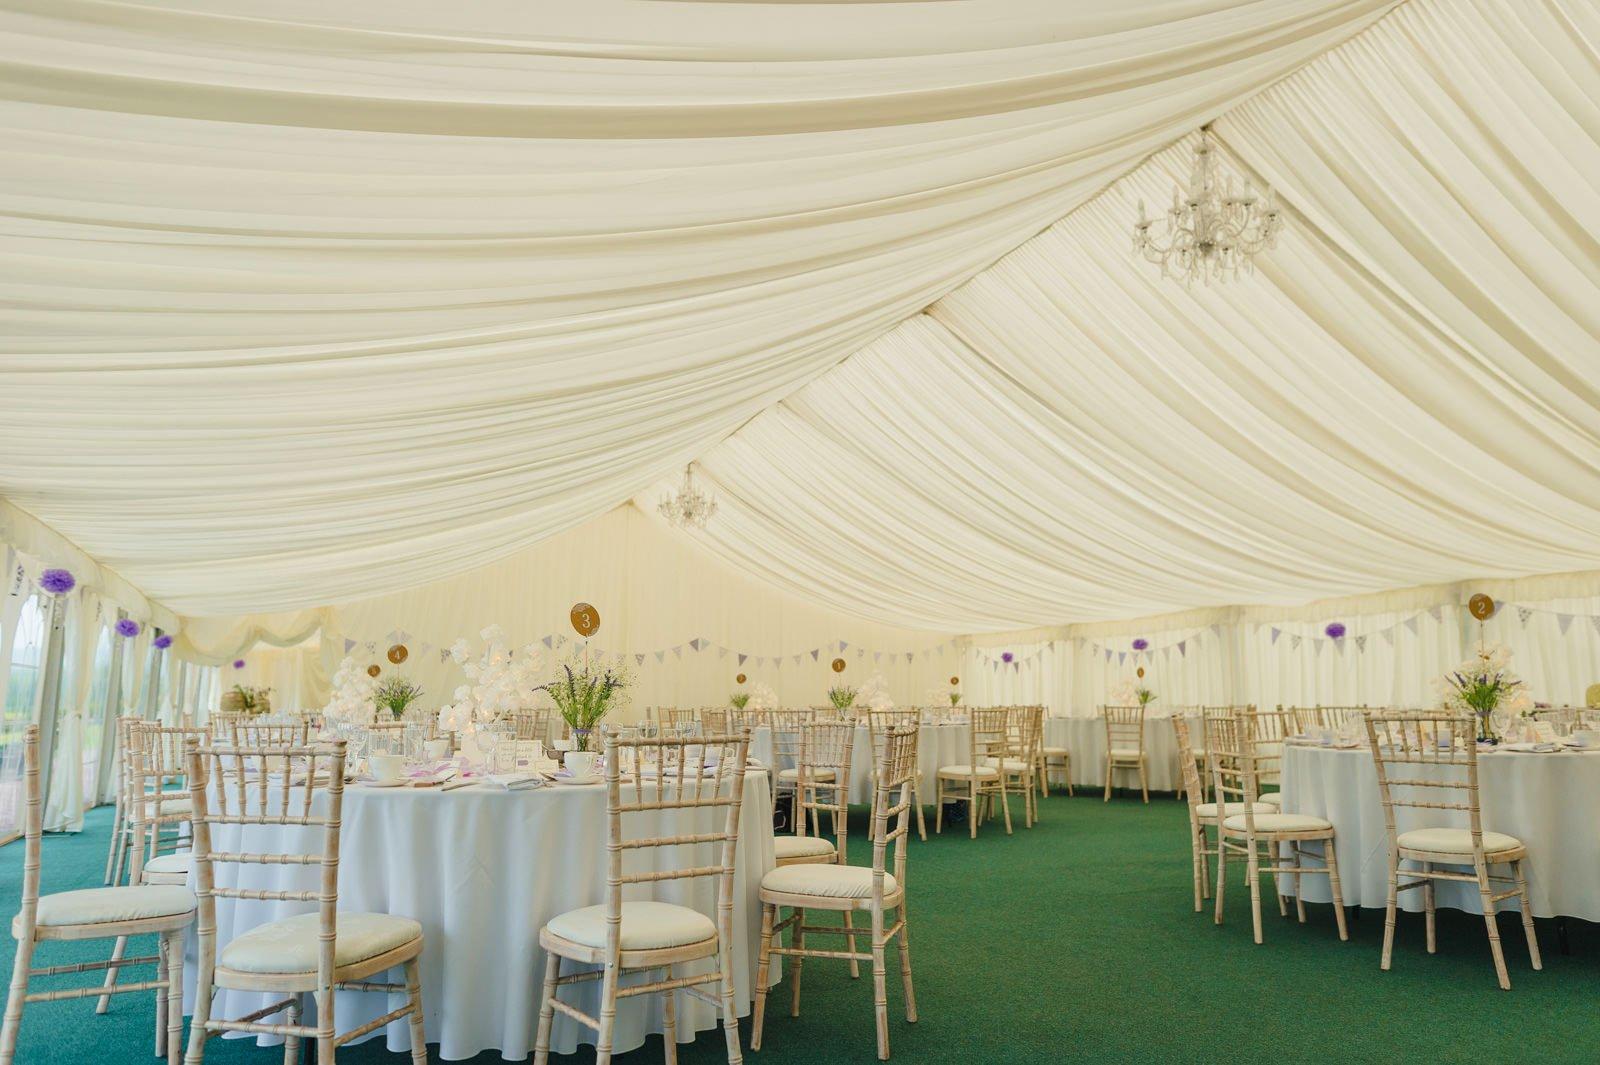 Millers Of Netley wedding, Dorrington, Shrewsbury | Emma + Ben 48